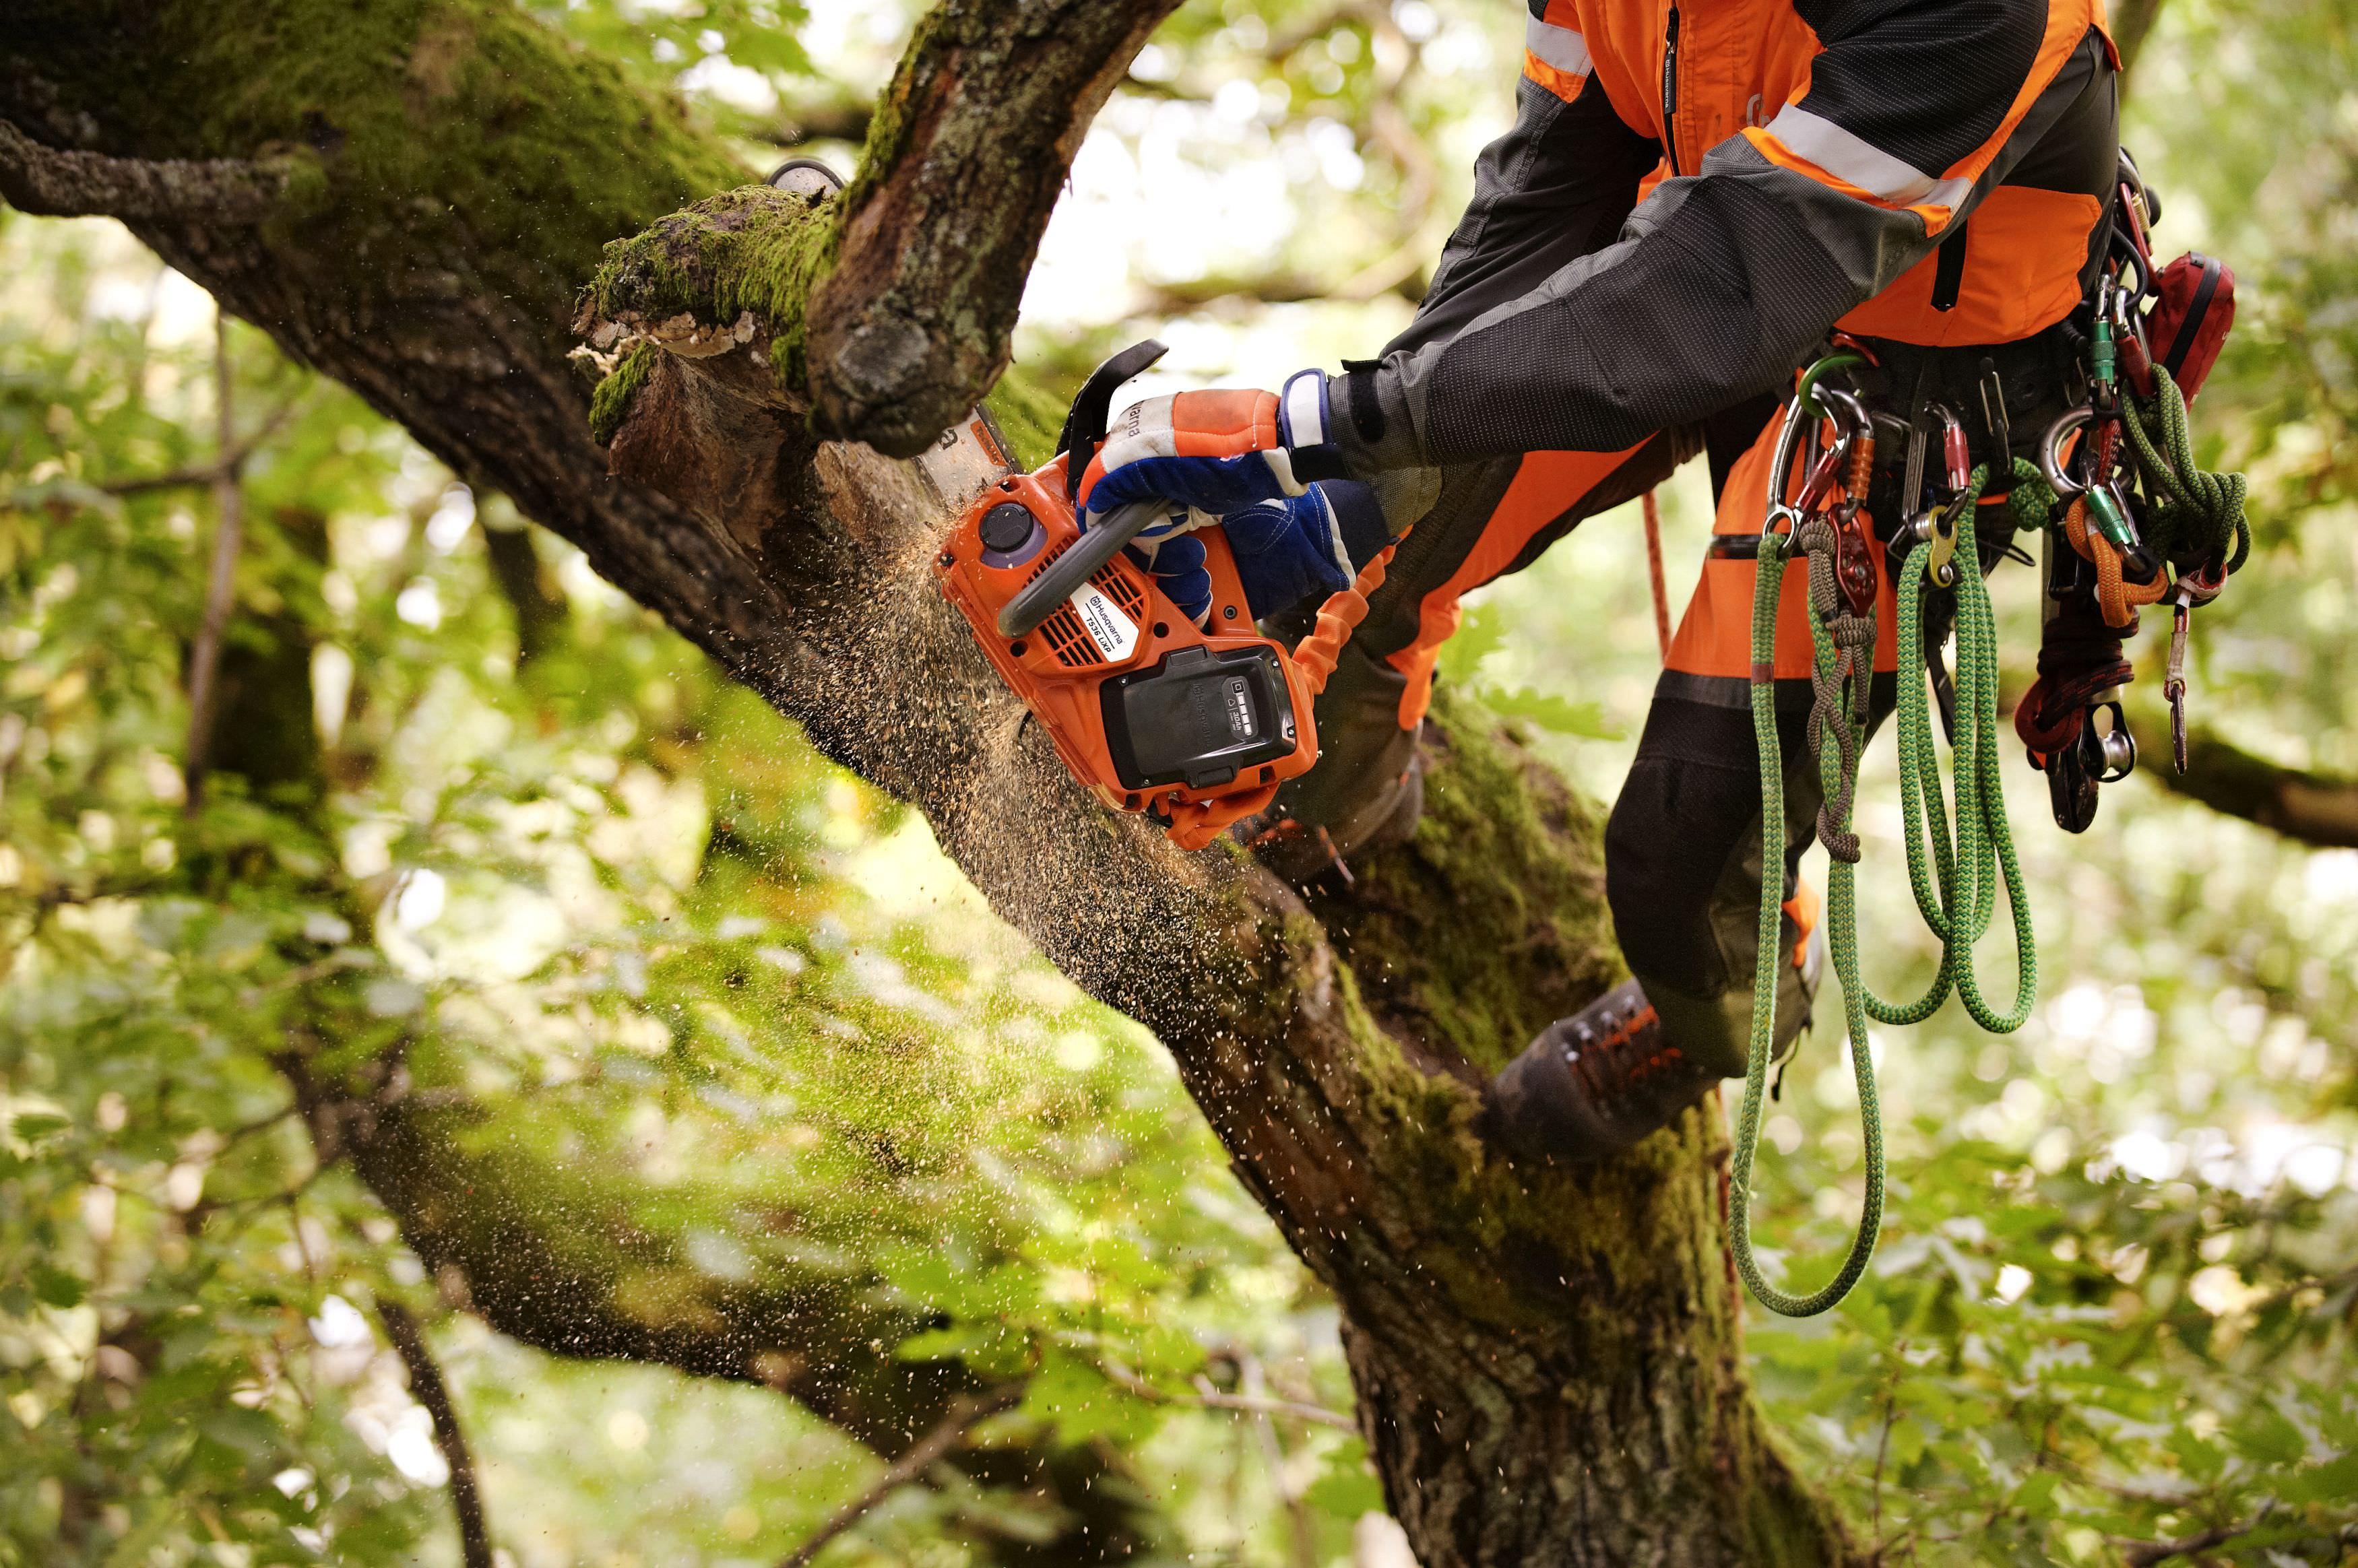 An important announcement regarding Glendale Tree Services